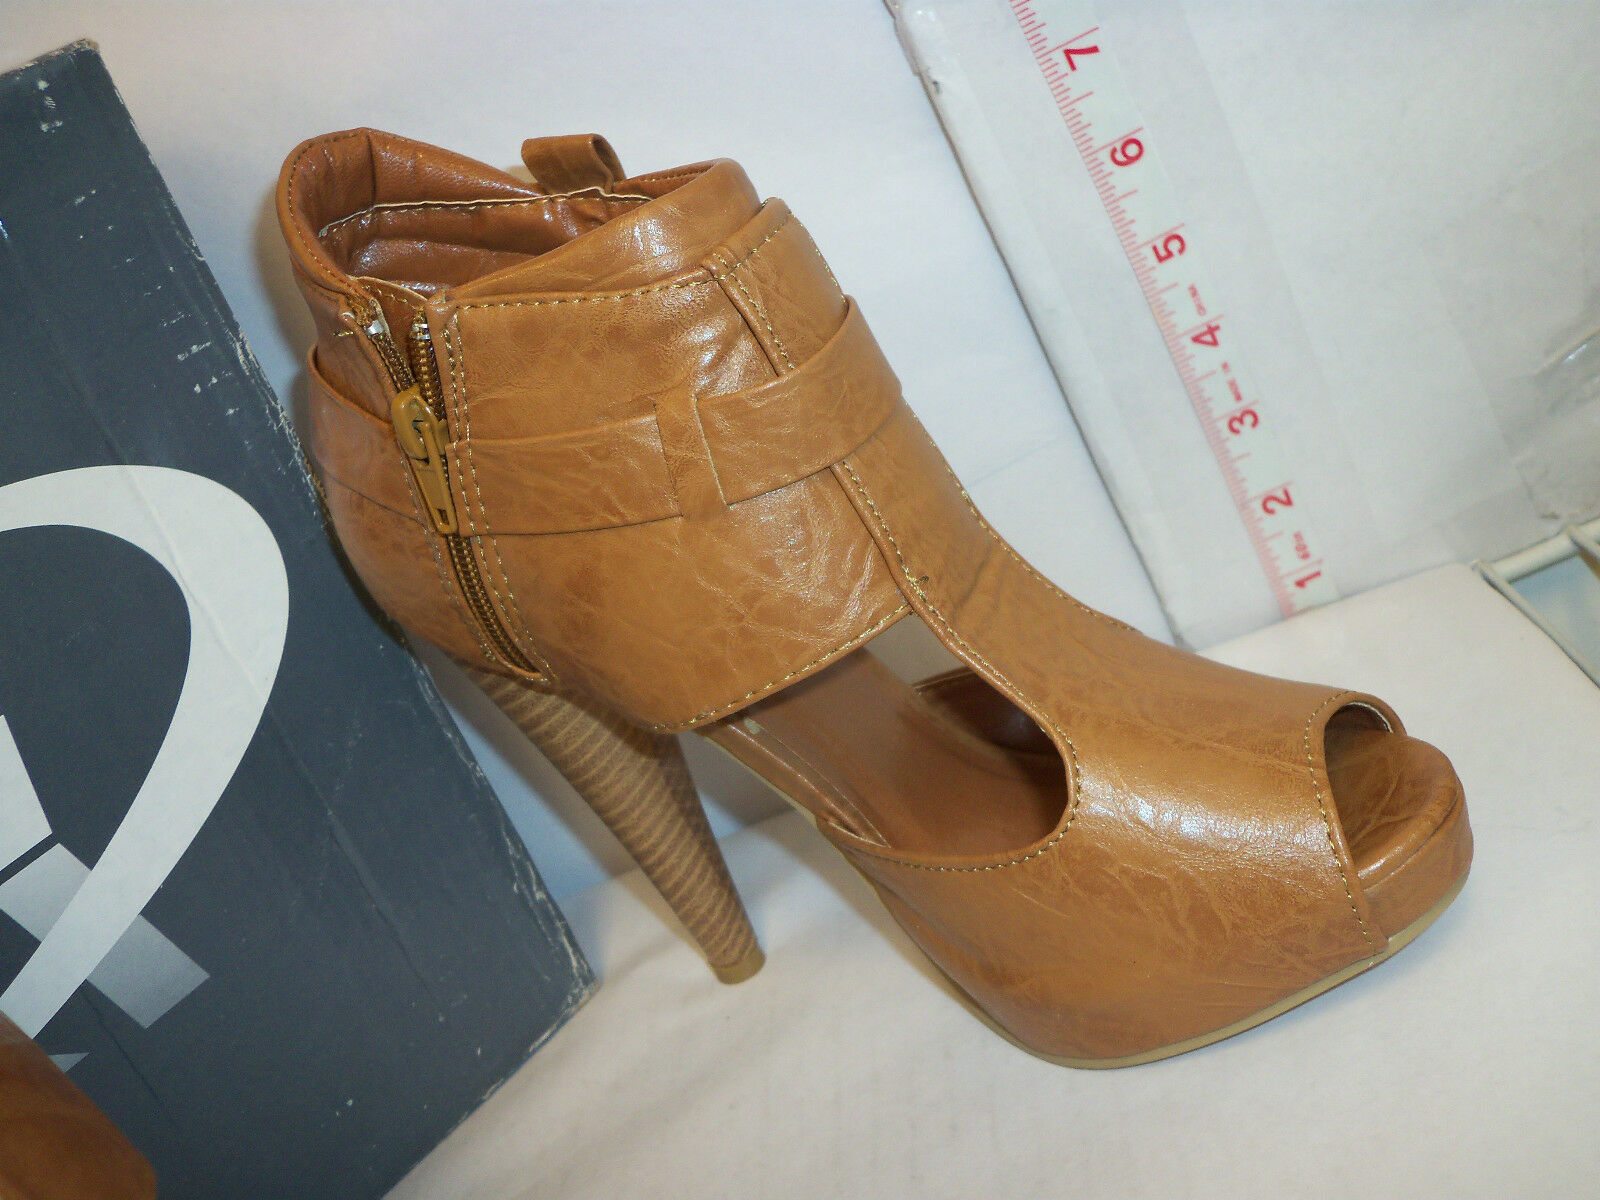 Yoki New damen damen damen Beyonce Rust 6.5 Open Toe Heels schuhe 9de8be